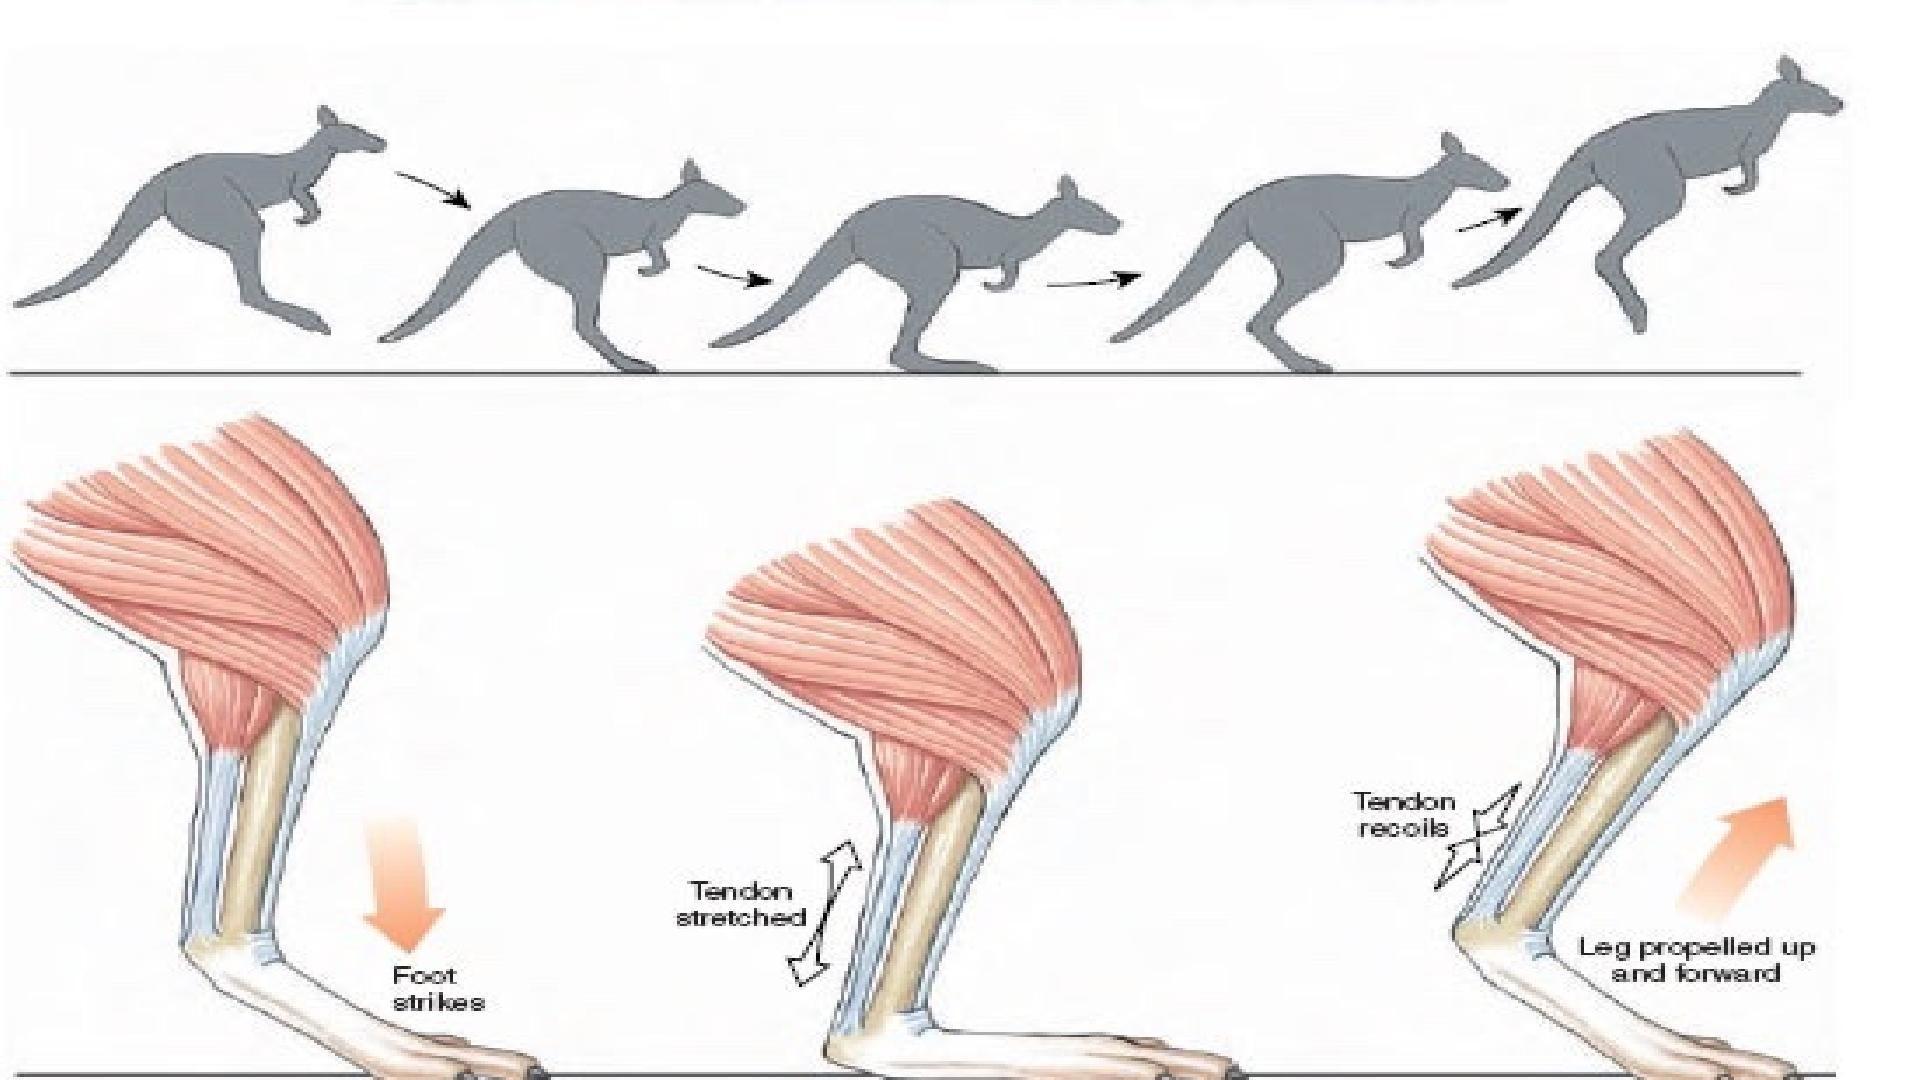 kangaroo_muscle | anatomy(animal) | Pinterest | Kangaroos, Animal ...